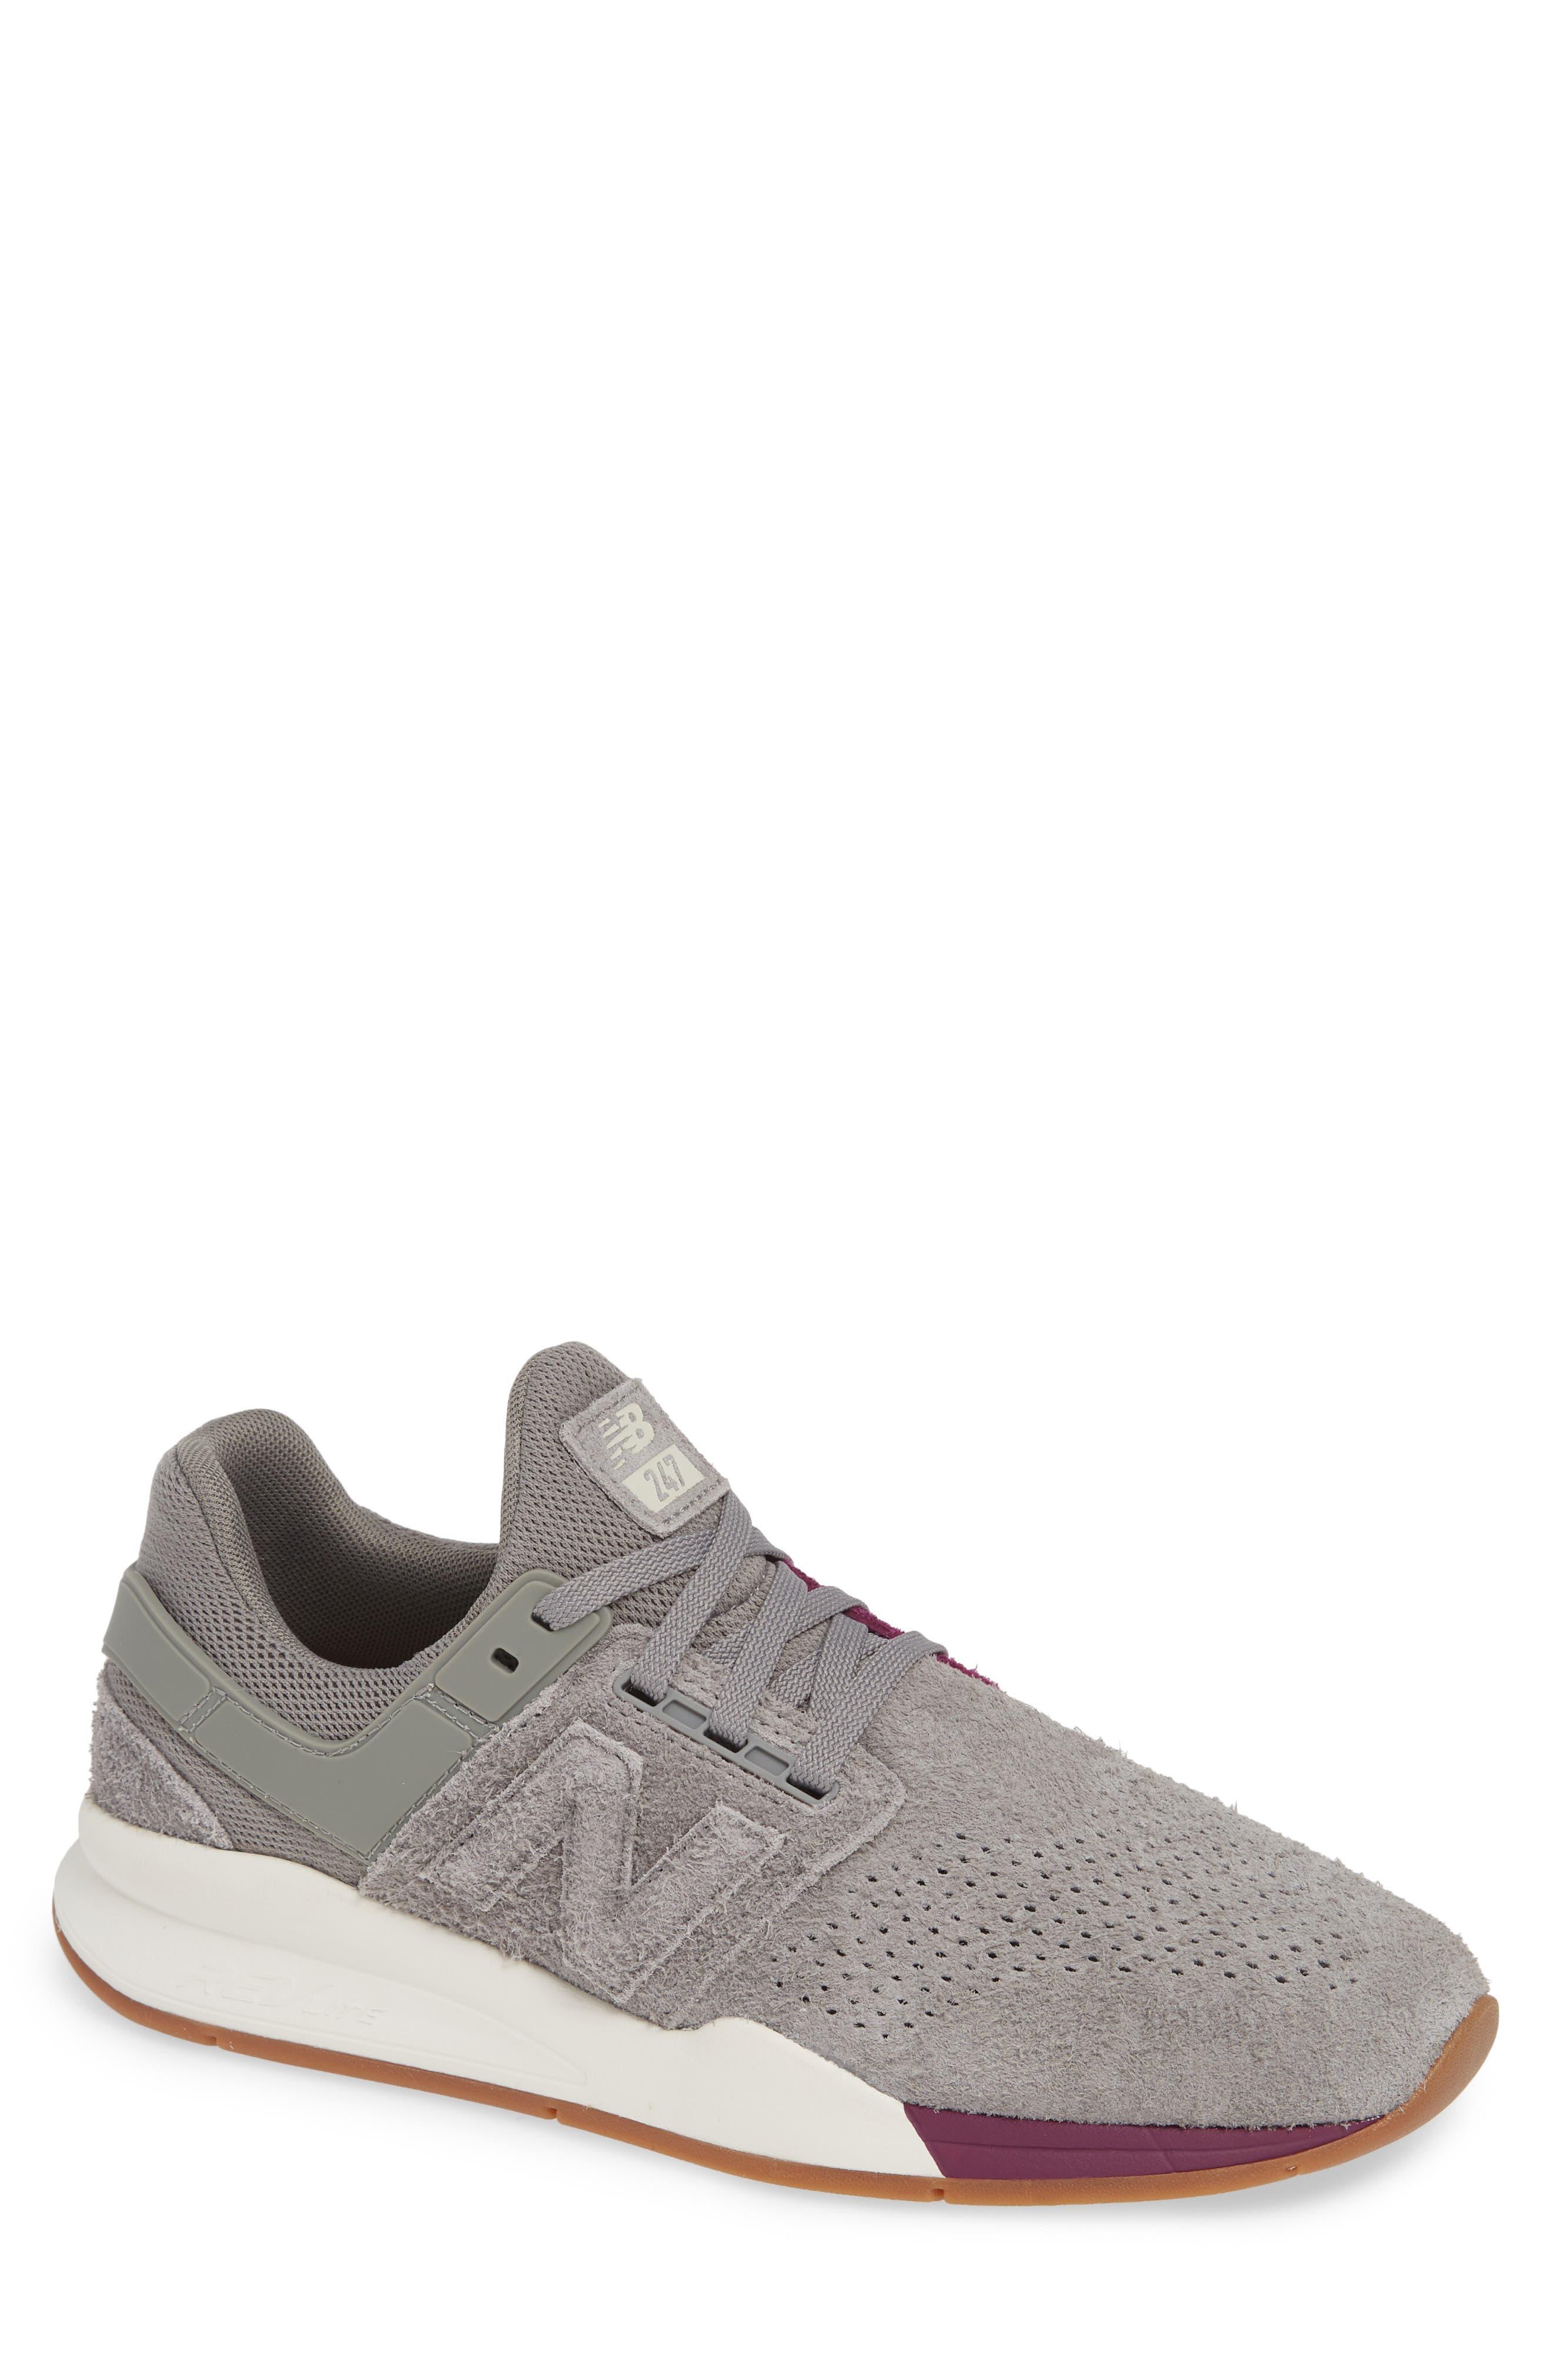 247 Suede Sneaker,                         Main,                         color, MARBLEHEAD SUEDE